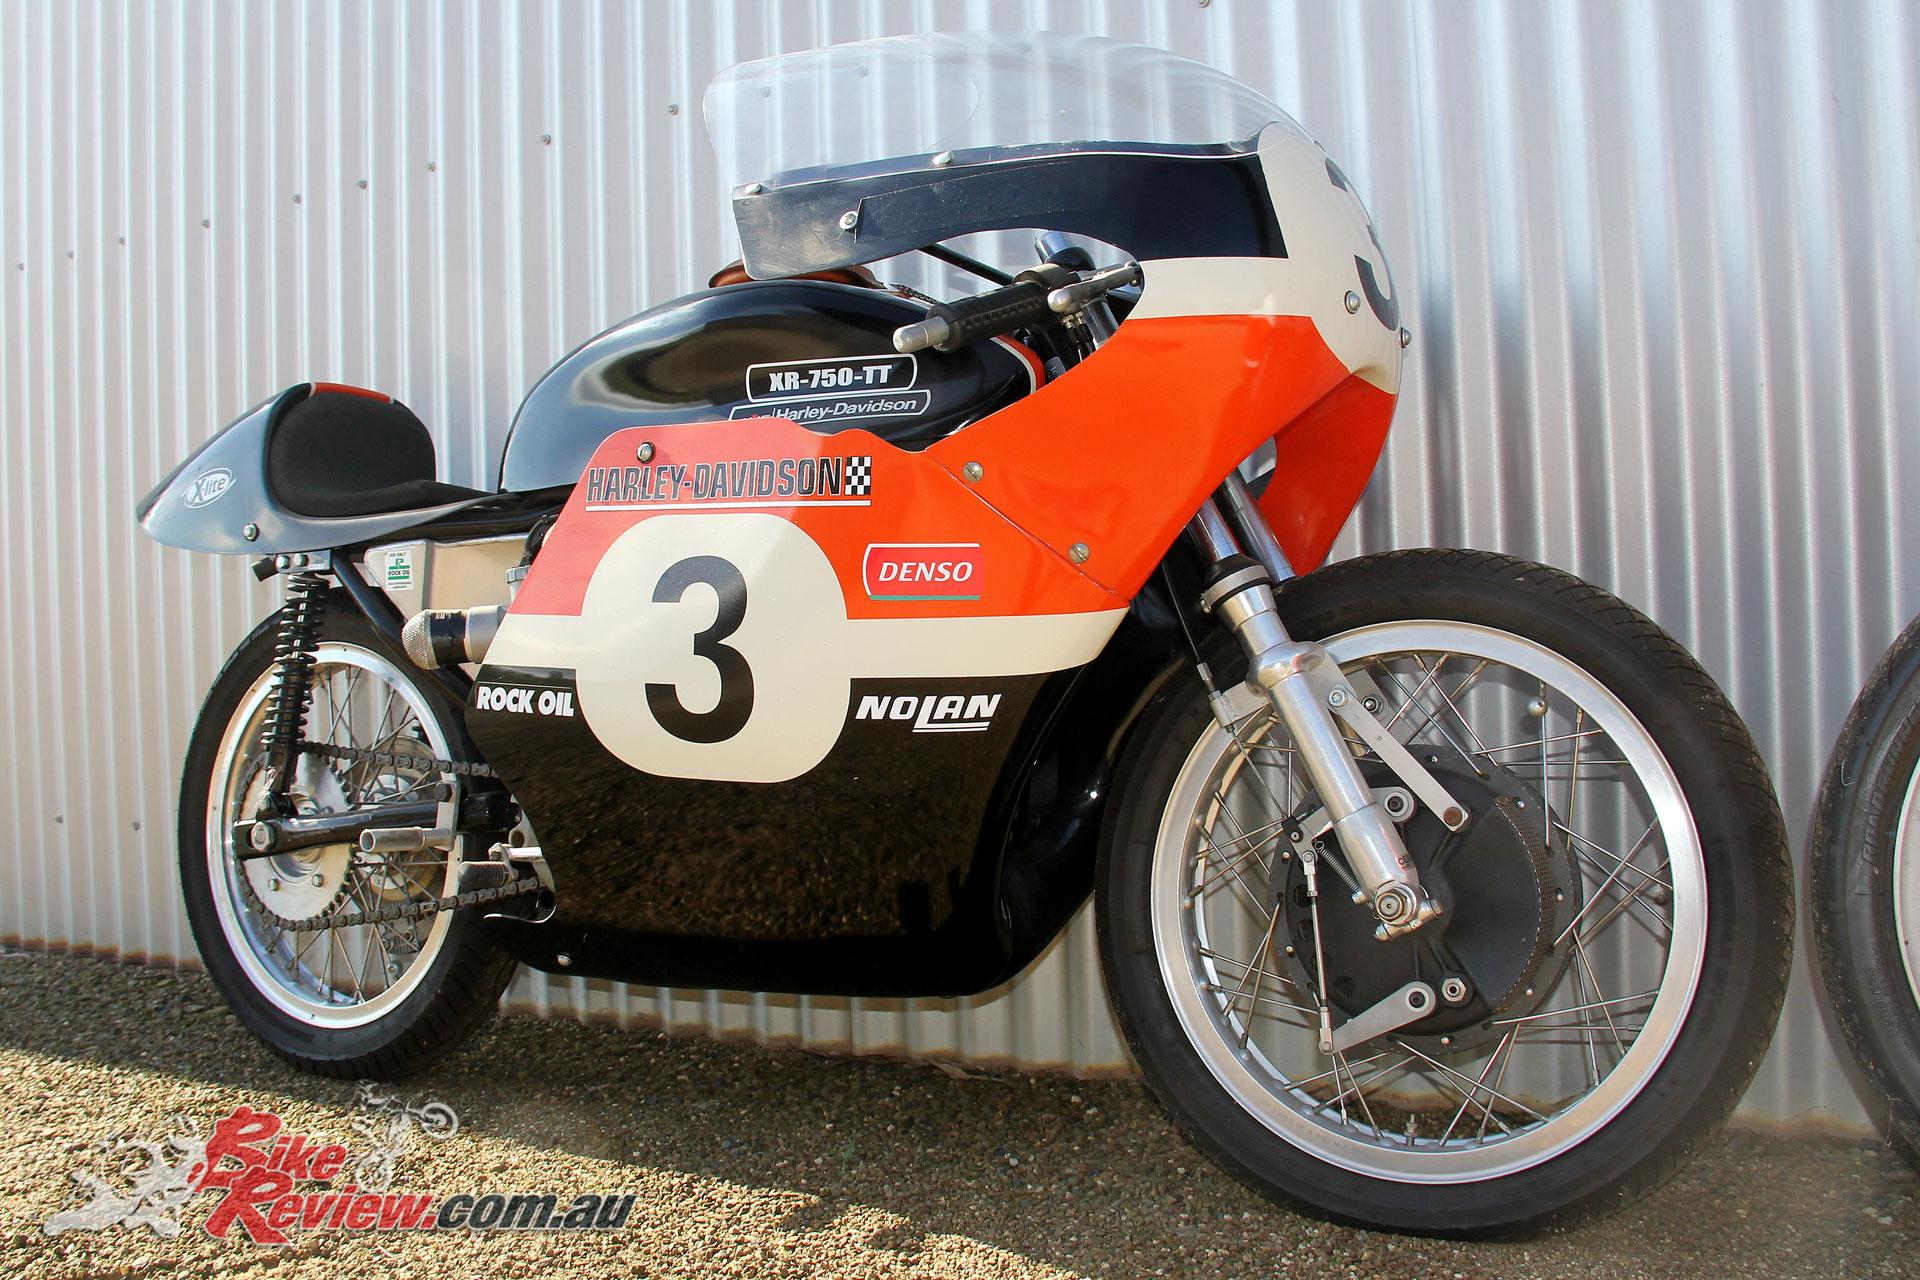 A Harley-Davidson XR 750 TT replica